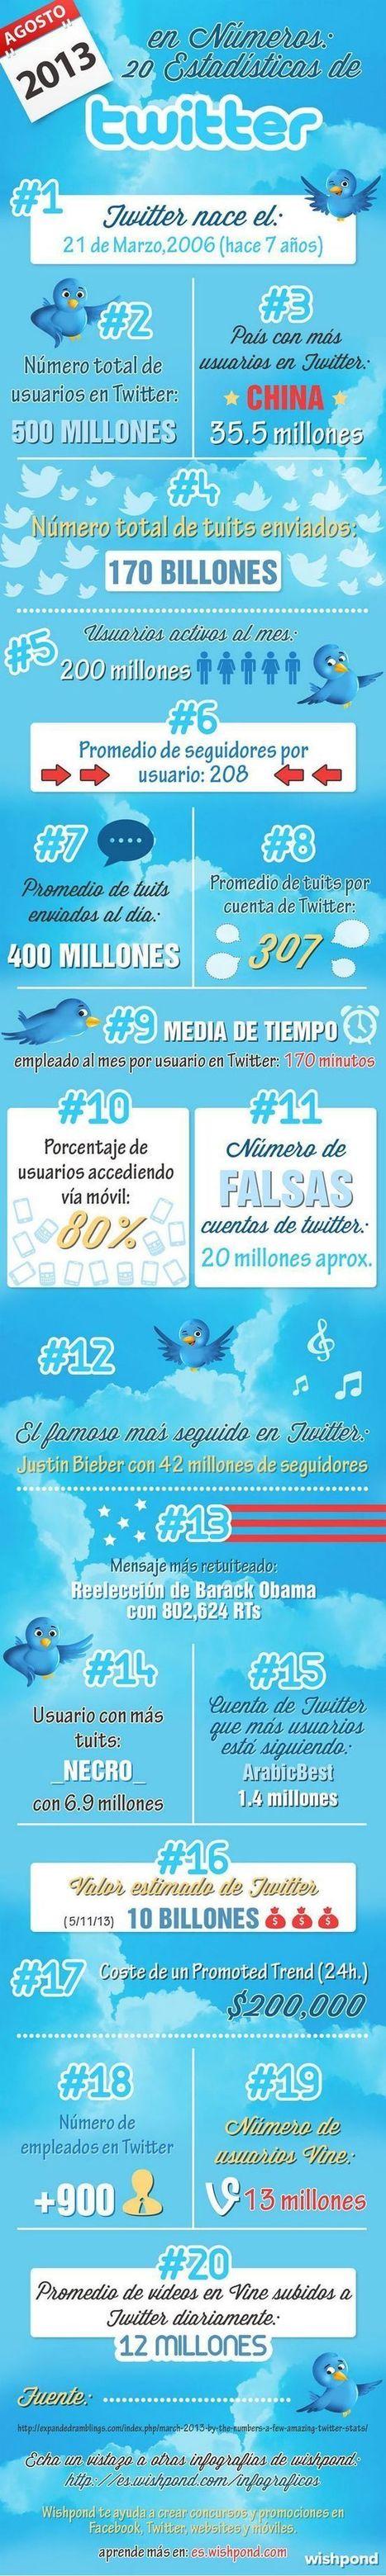 Los números actuales de Twitter   Seo, Social Media Marketing   Scoop.it